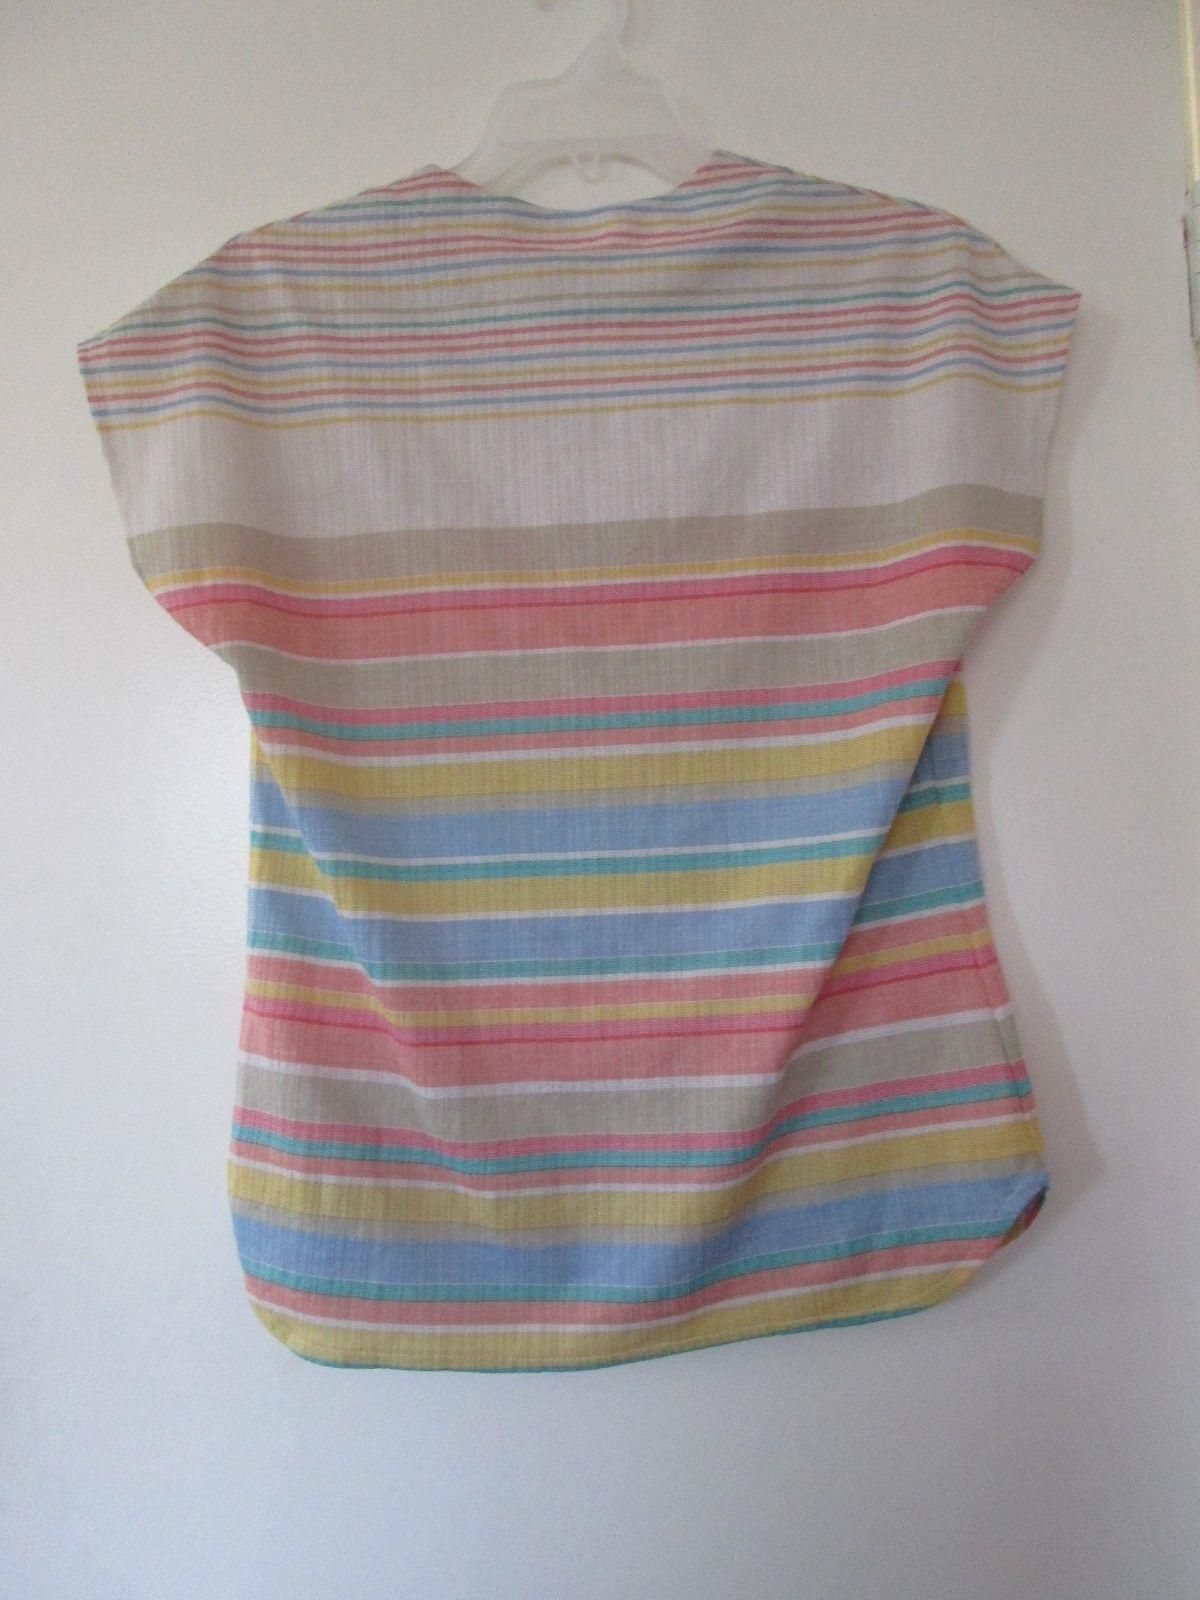 1980s vintage cute white pink rainbow striped stretch shirt size medium large